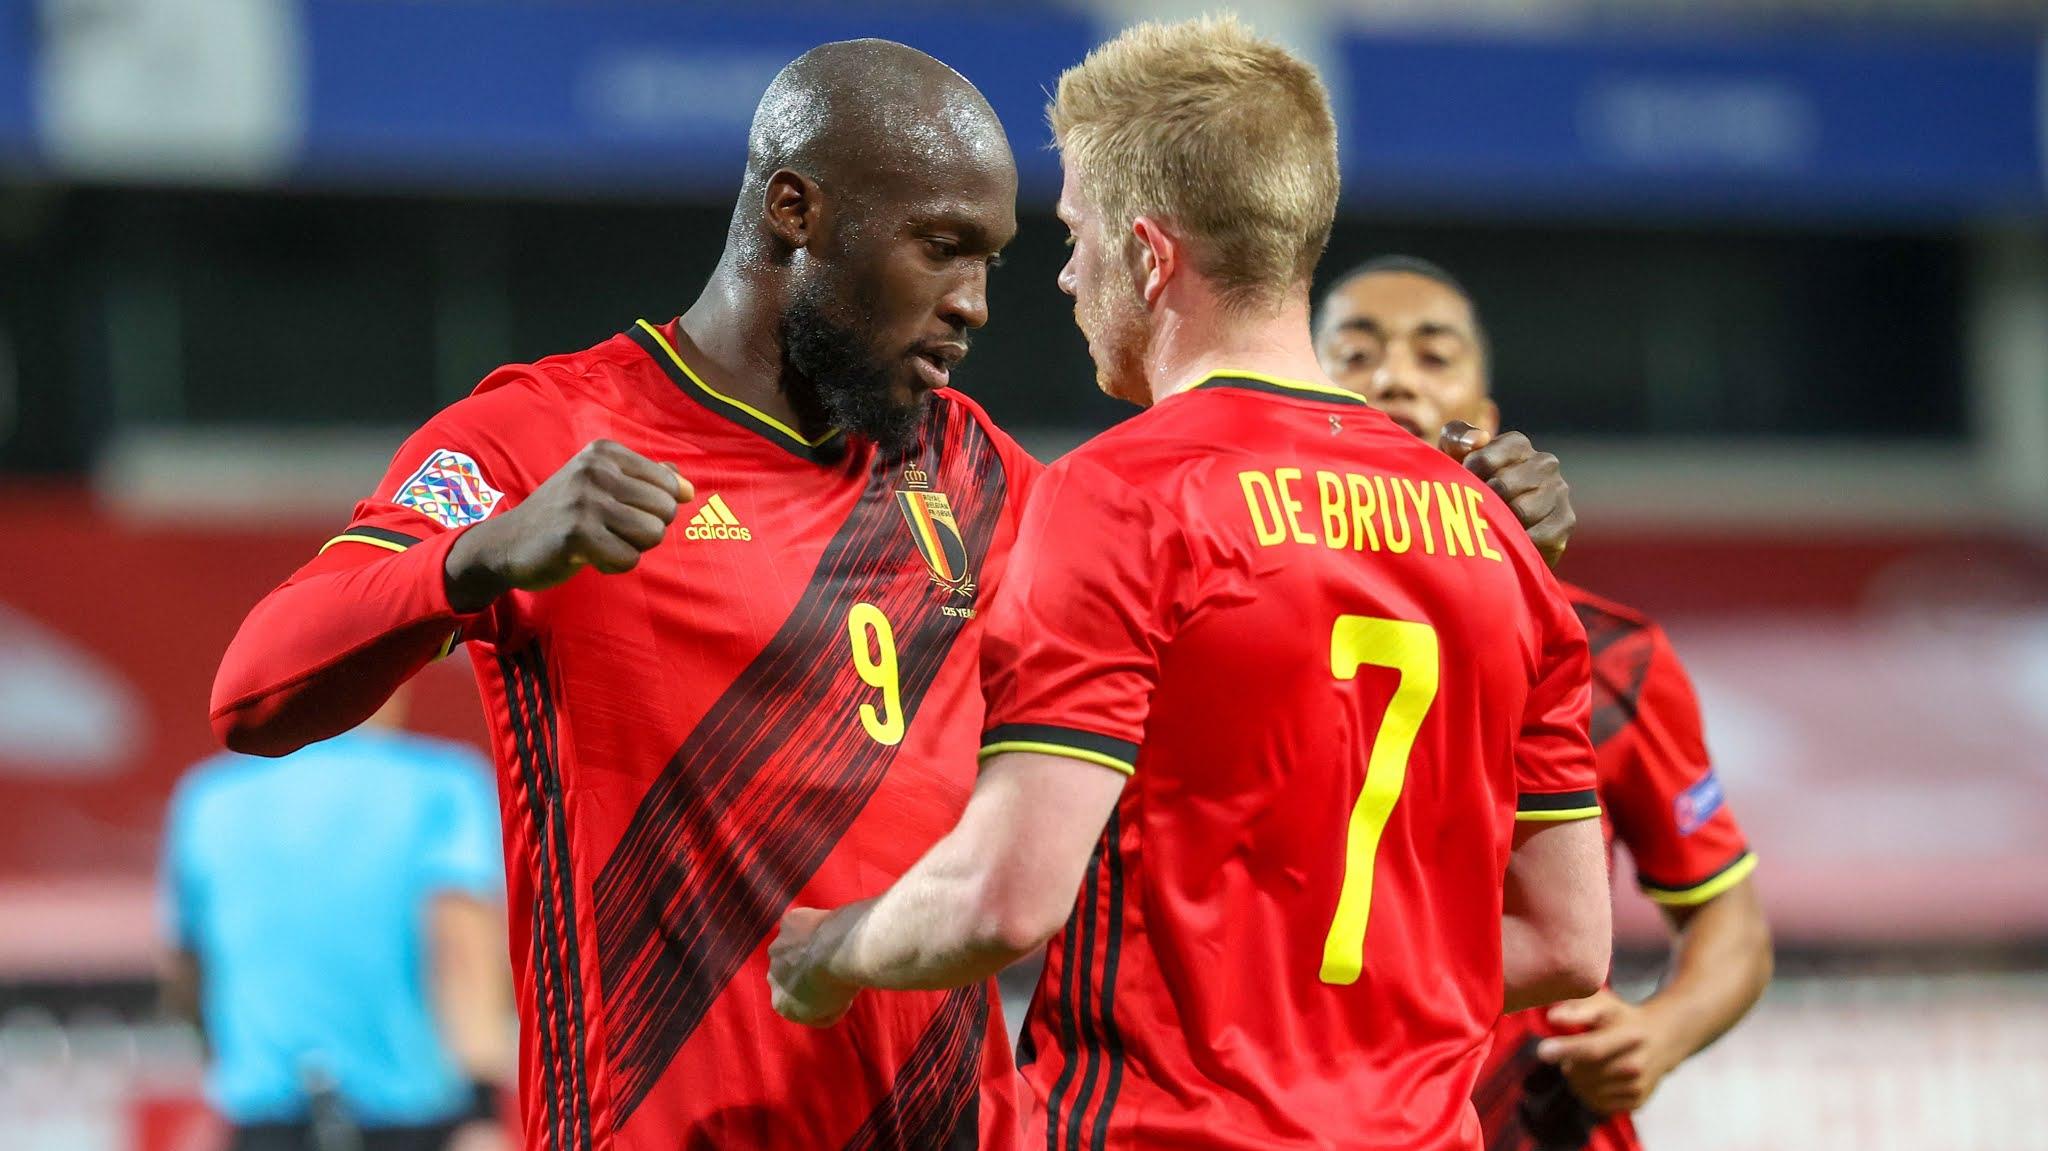 Belgium's spearhead Romelu Lukaku continues playing at an incredible level